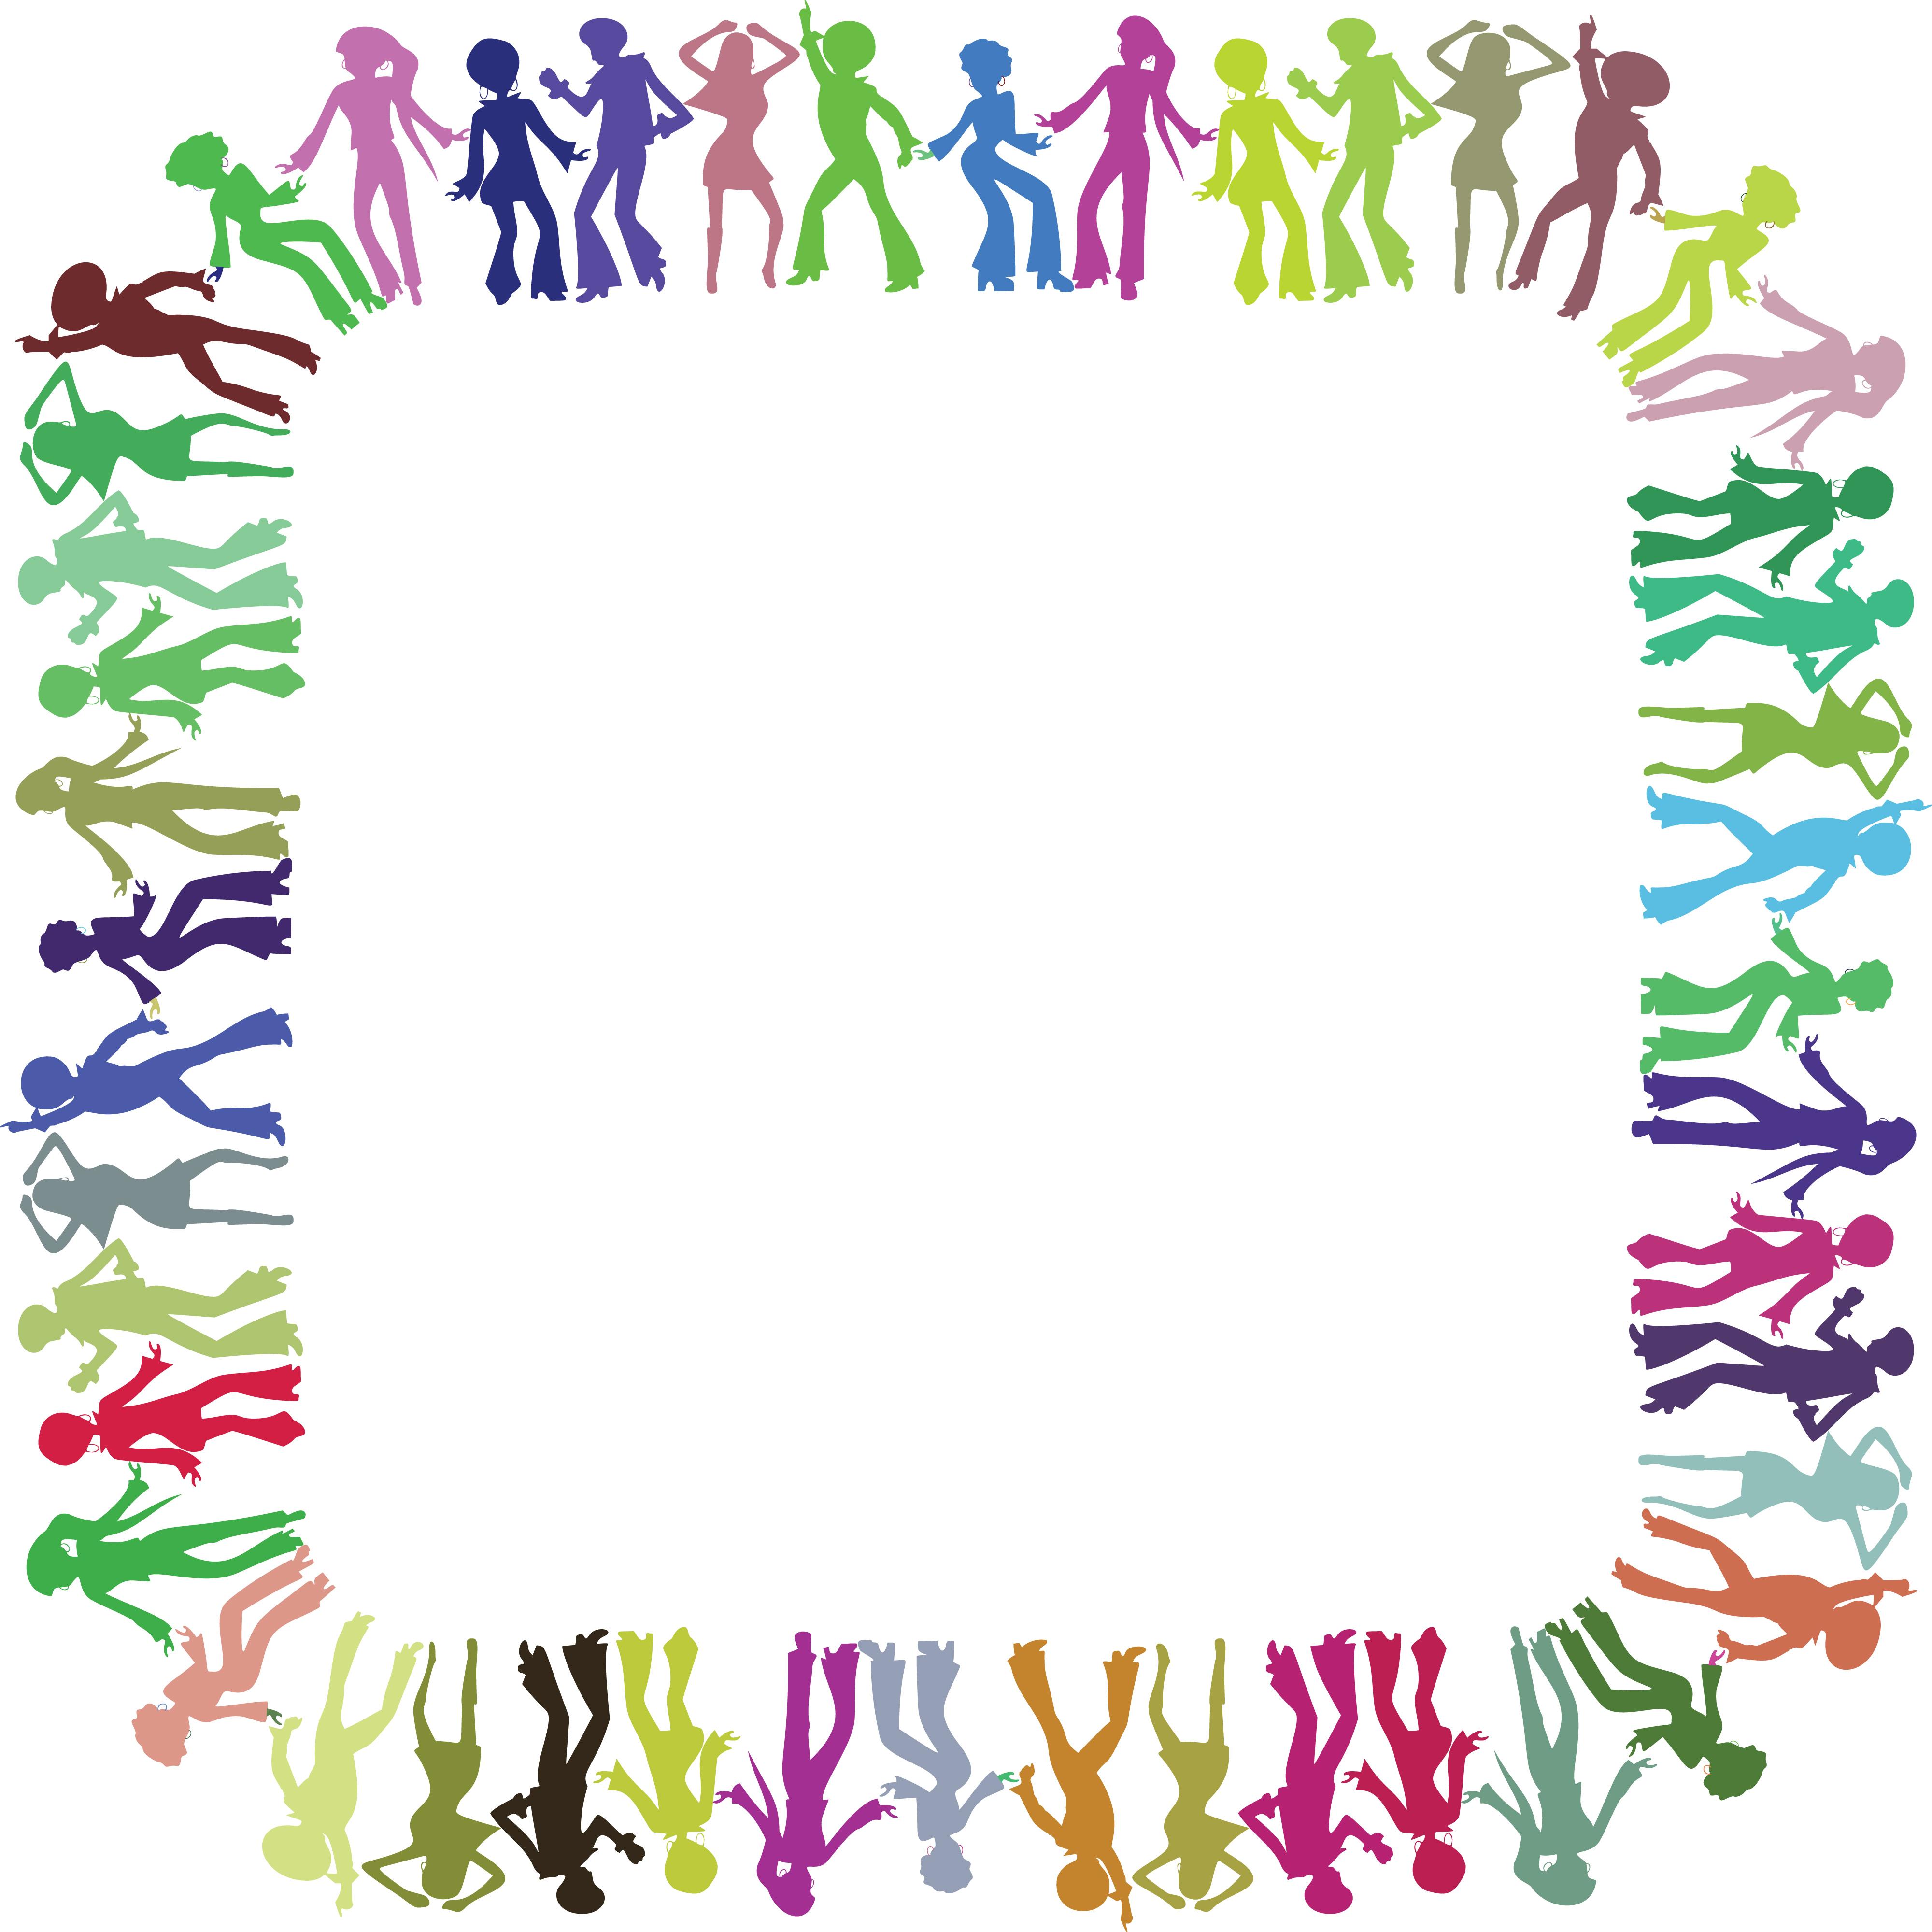 clipart of a square border frame of colorful disco dancers rh free clipartof com Jazz Dance Clip Art Ballet Dance Clip Art